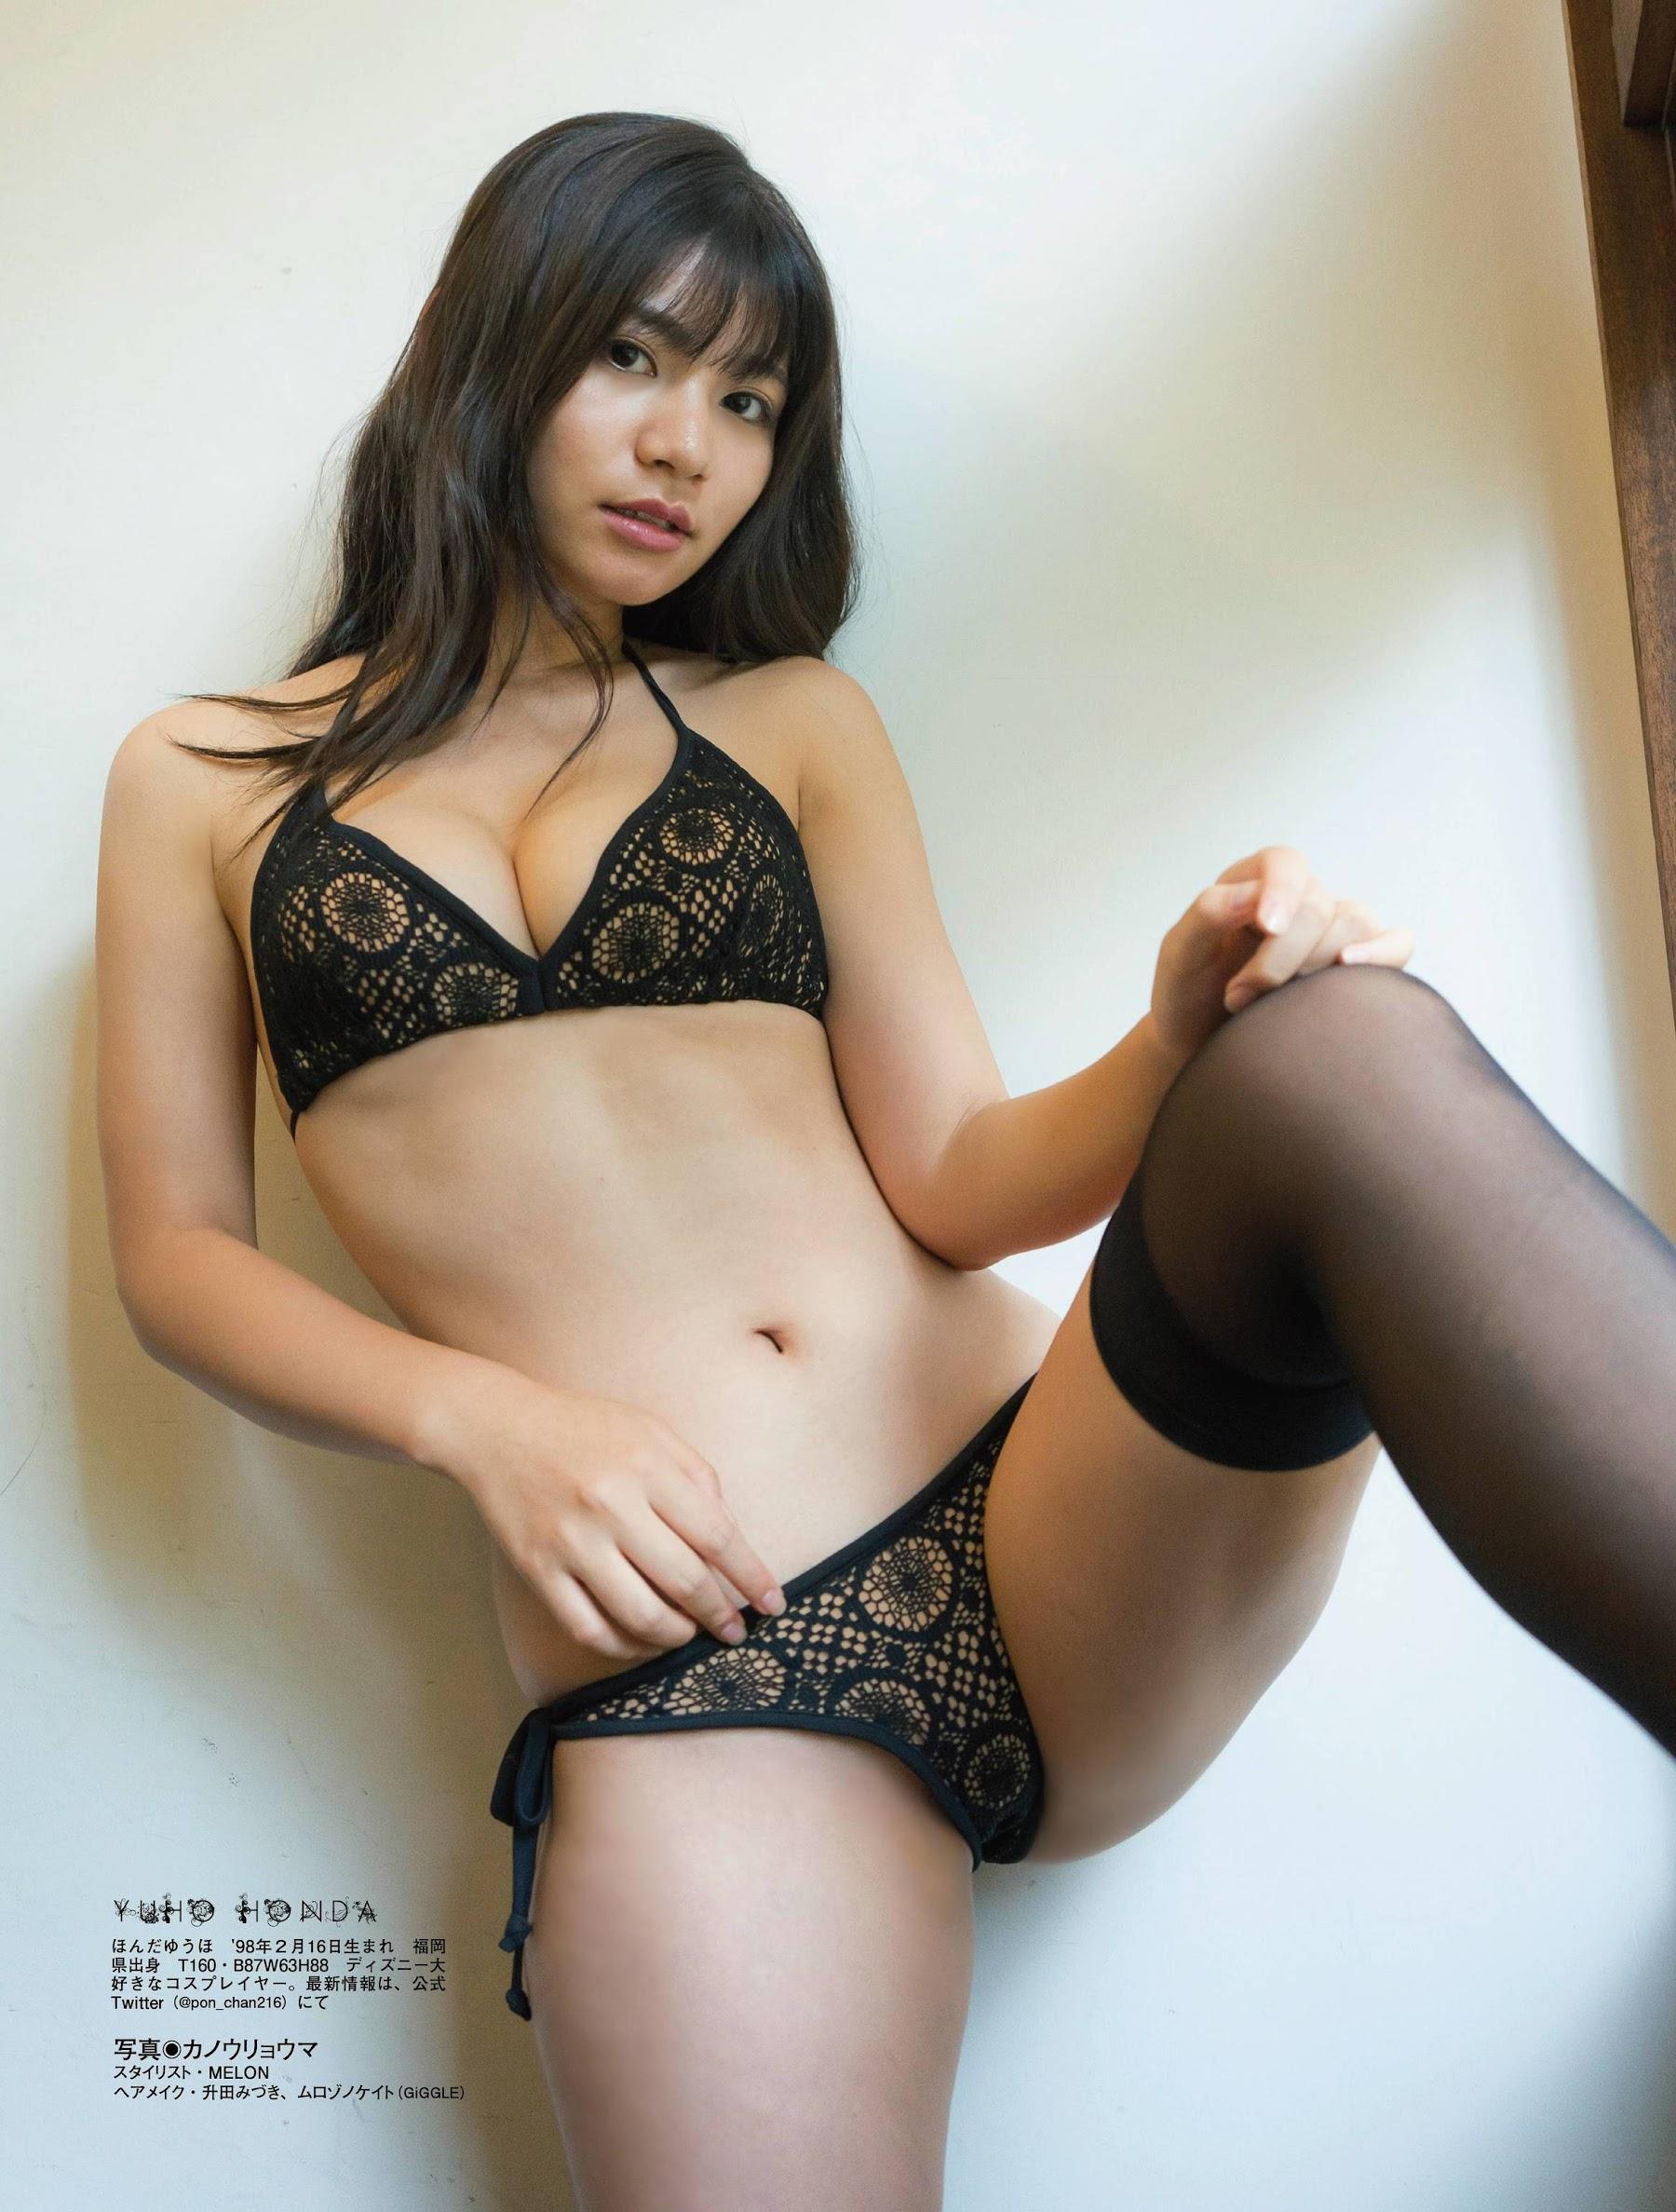 imouto ayu makihara 少女偶像